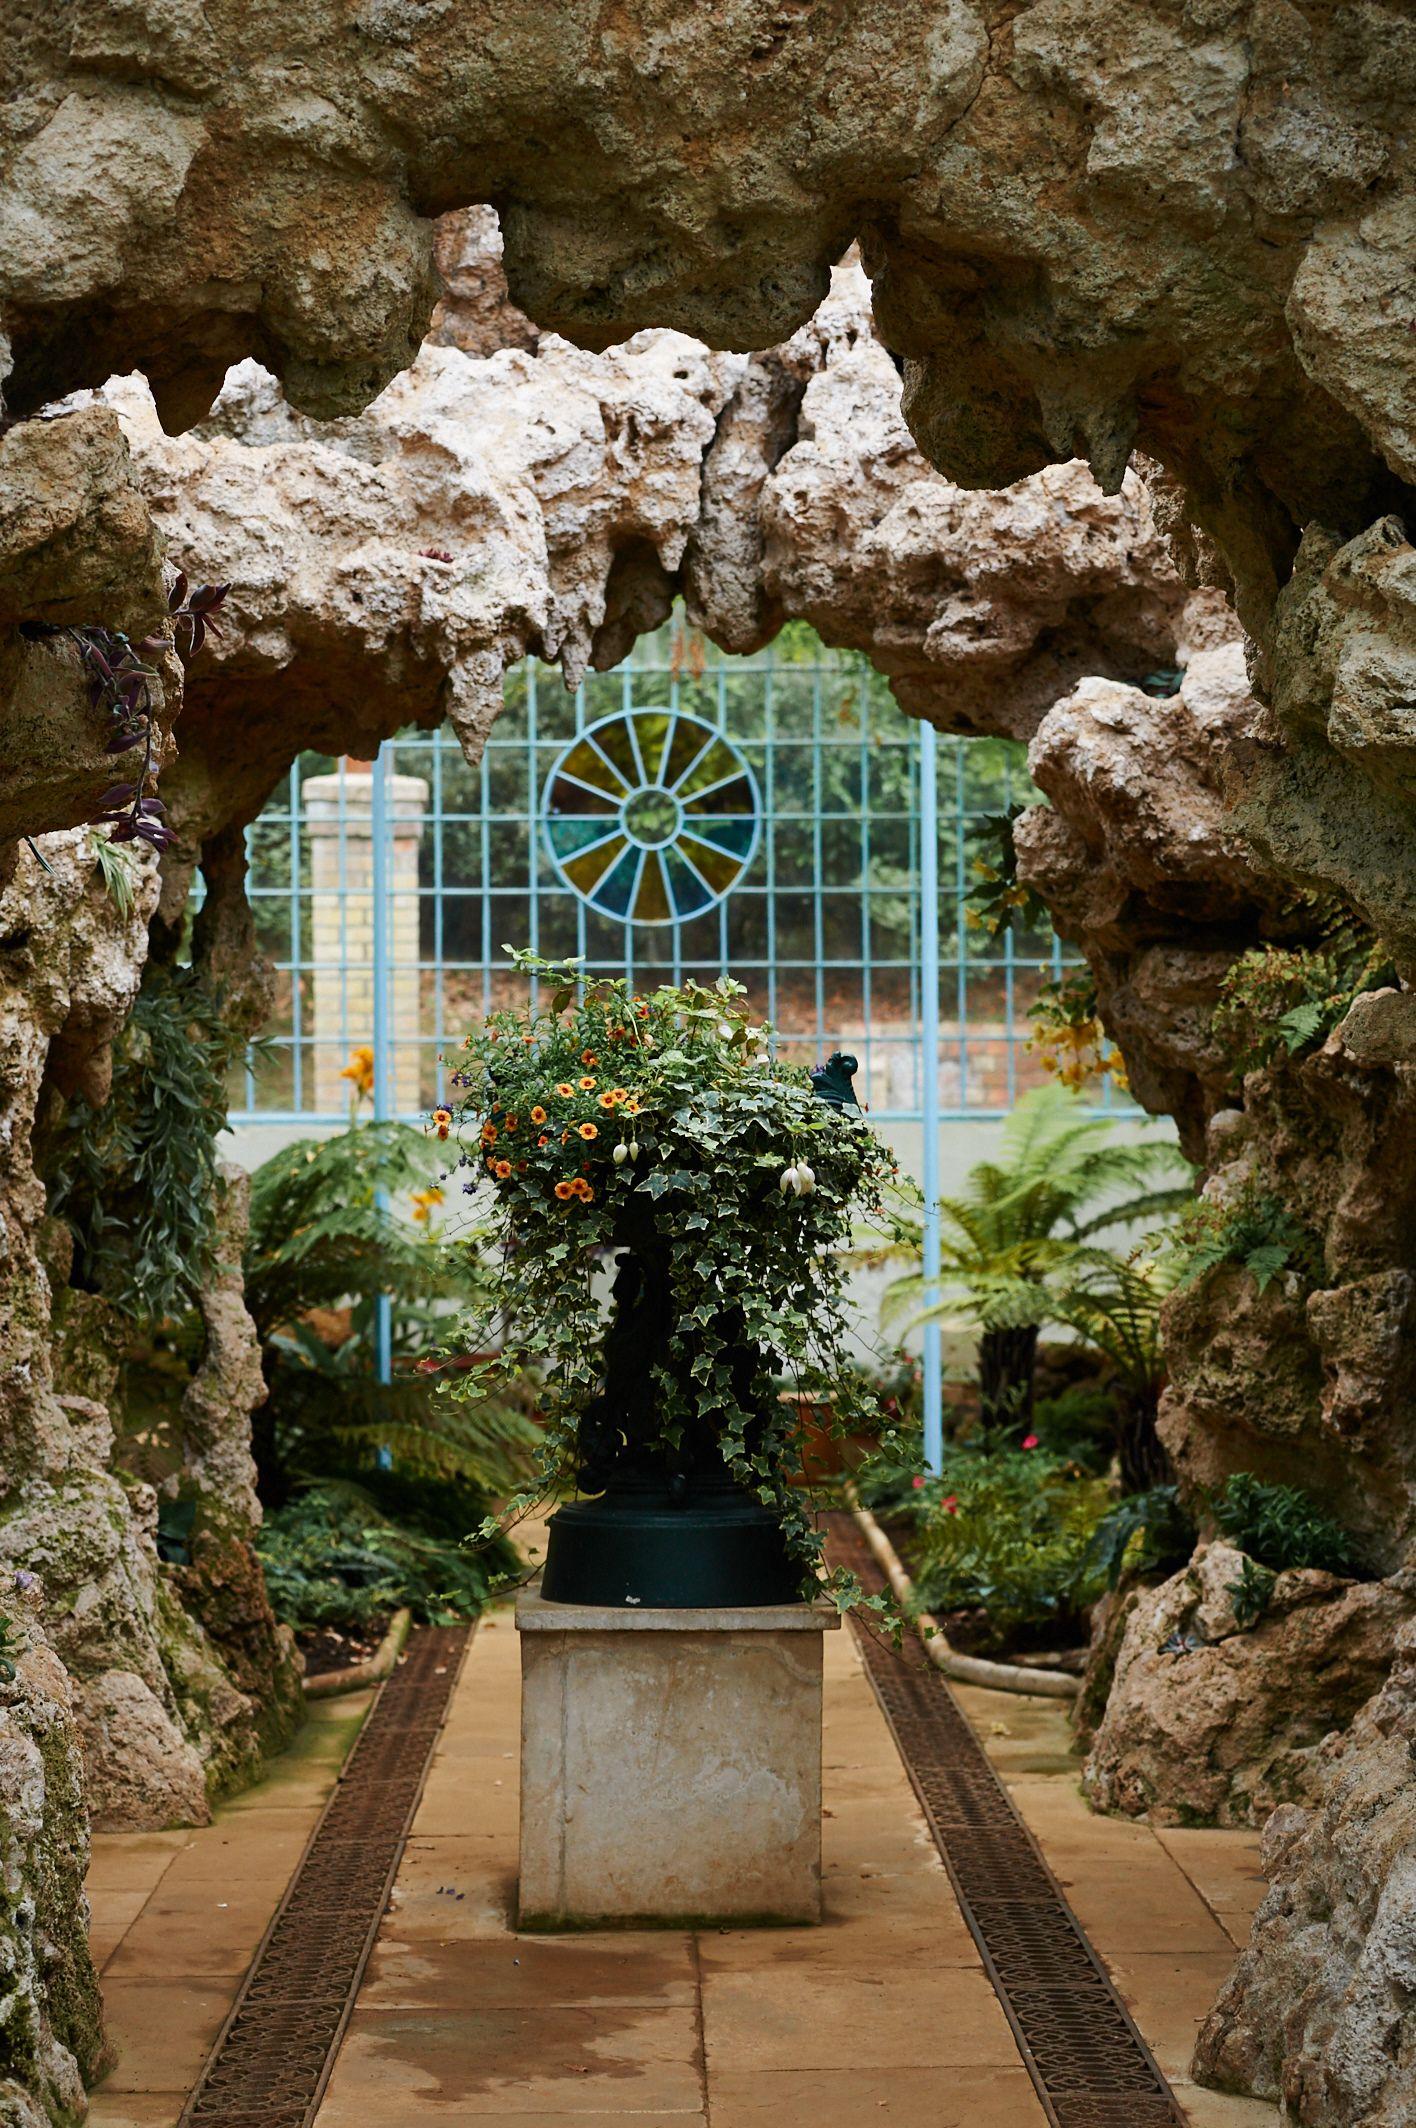 The Grotto In The Swiss Garden Shuttleworth Biggleswade One Of The Fairytale Follies Garden Structures Garden Biggleswade